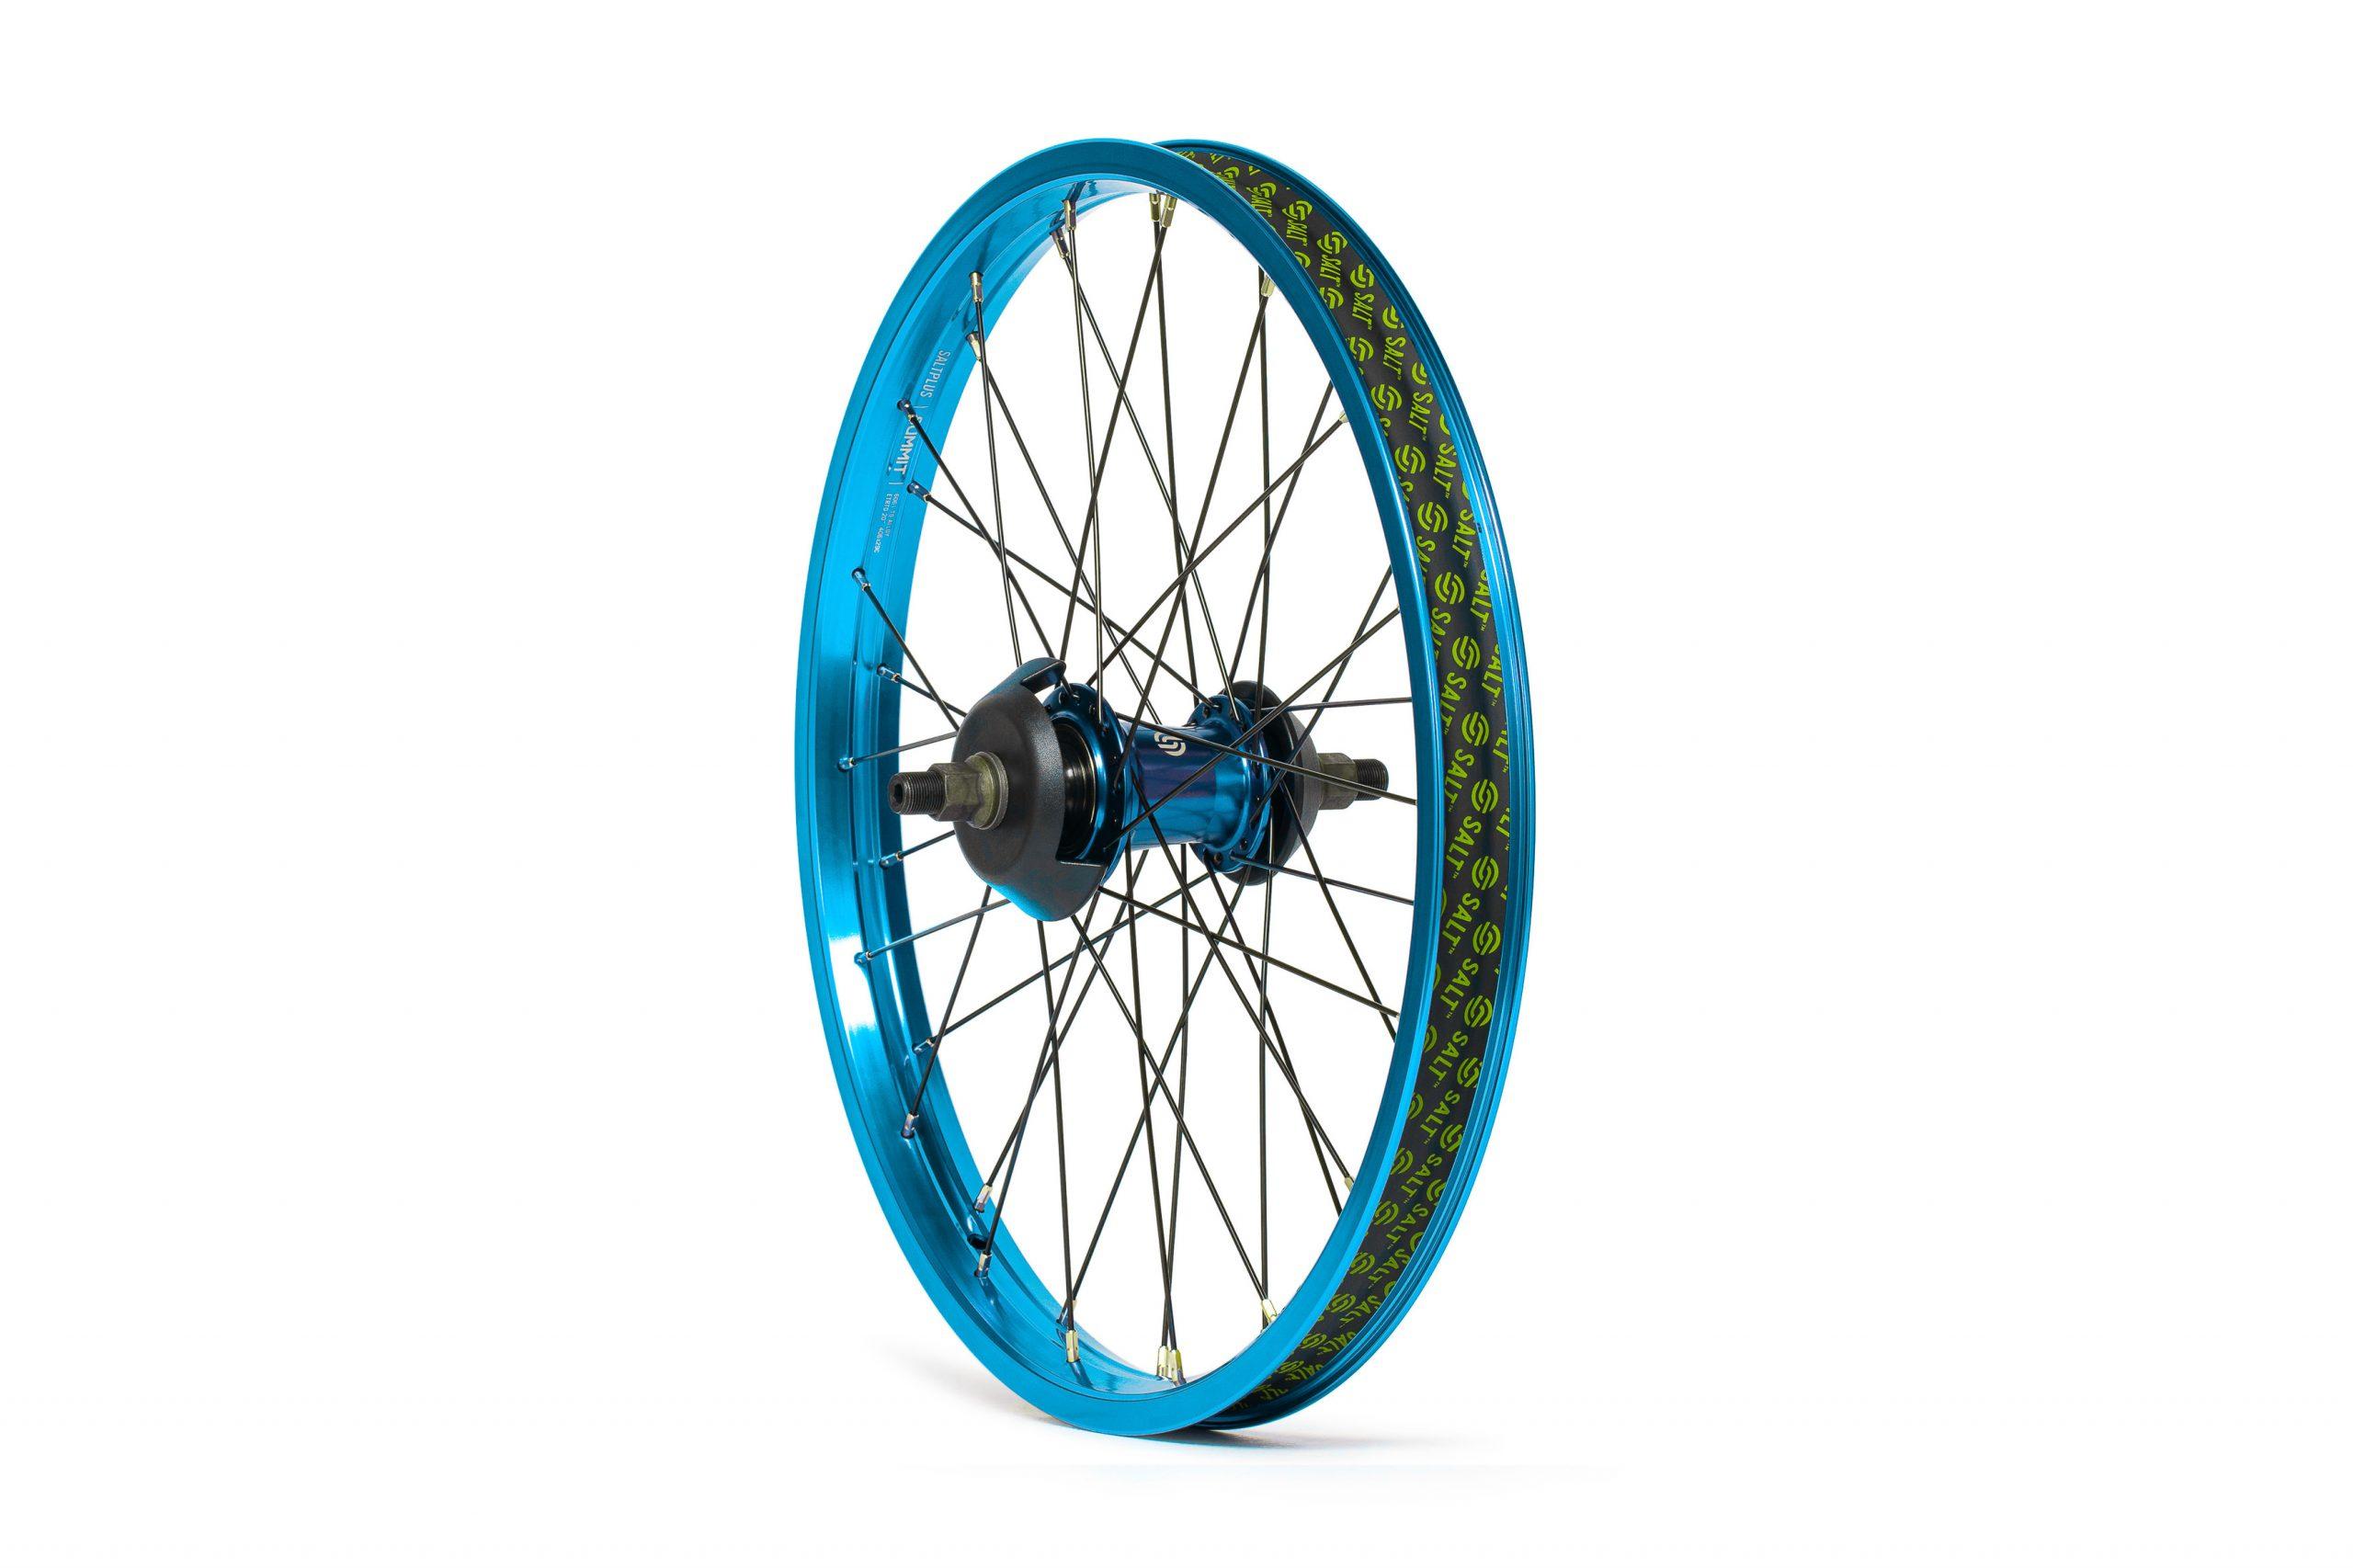 Salt_Everest_FC_rear_wheel_cyan-02